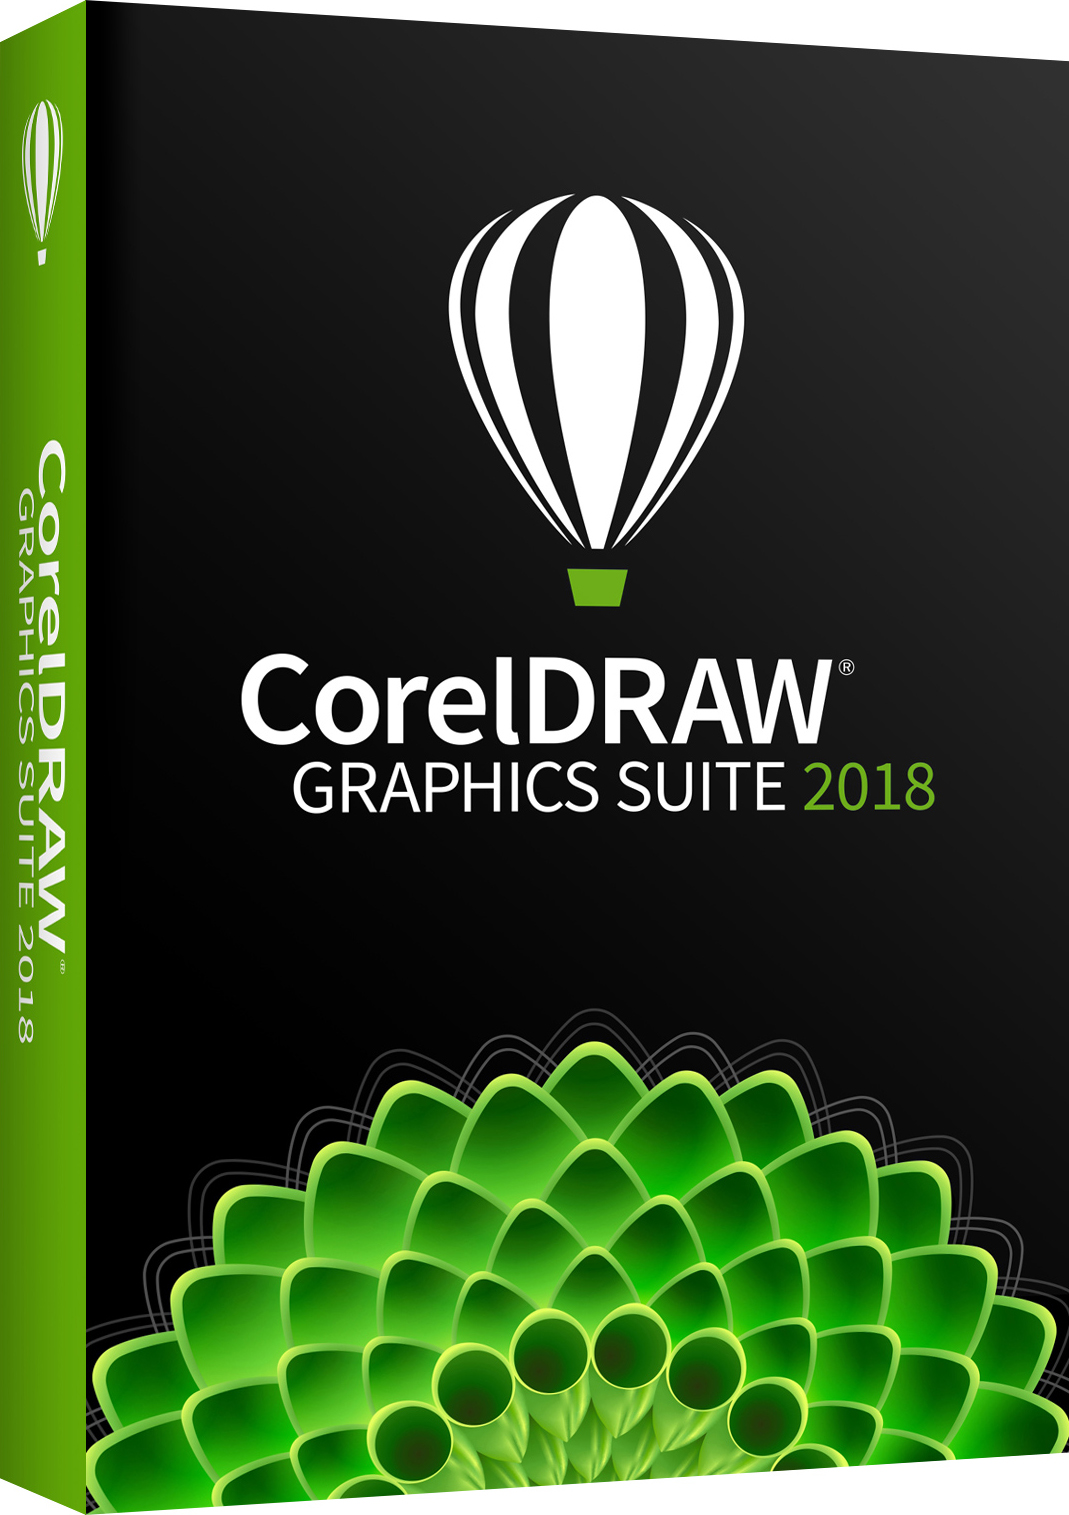 CorelDRAW Graphics Suite 2018 [Цифровая версия] (Цифровая версия)